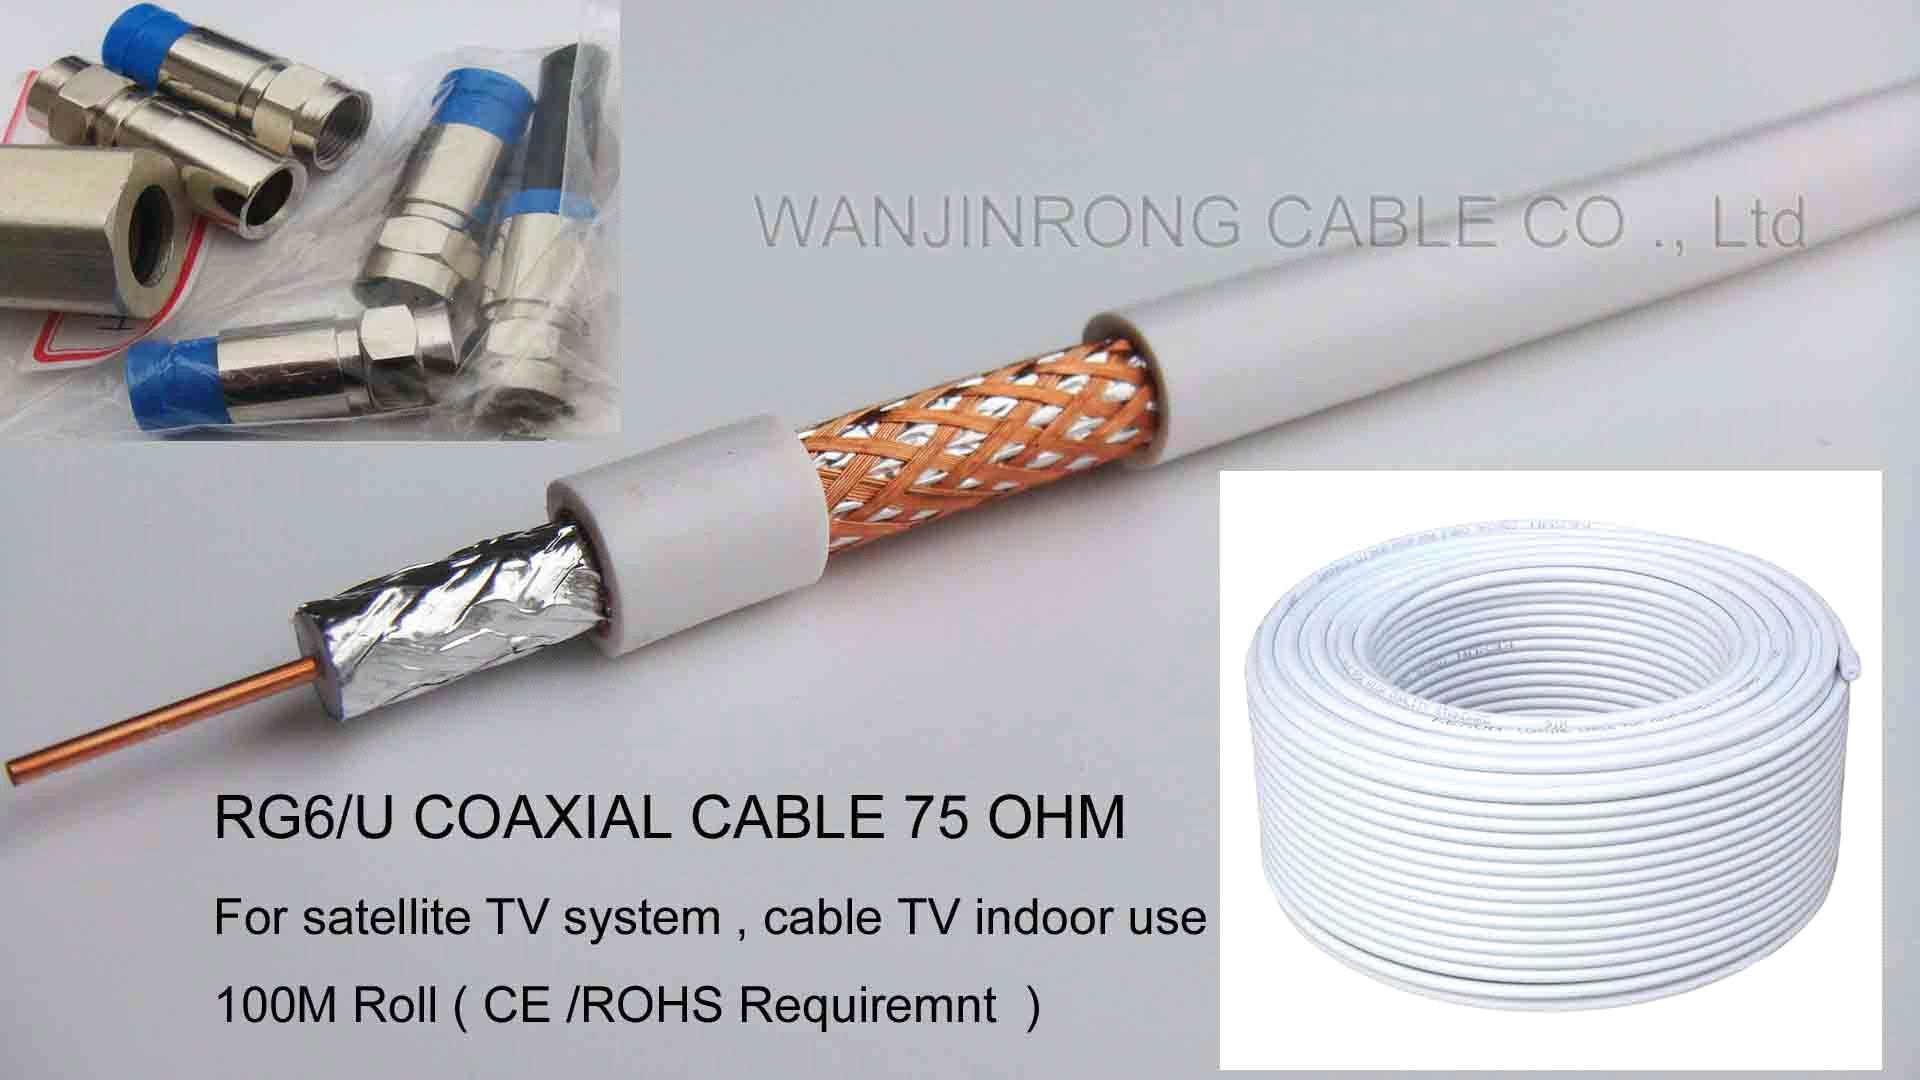 rg6u cable satellite tv cable cctv cable matv cable. Black Bedroom Furniture Sets. Home Design Ideas